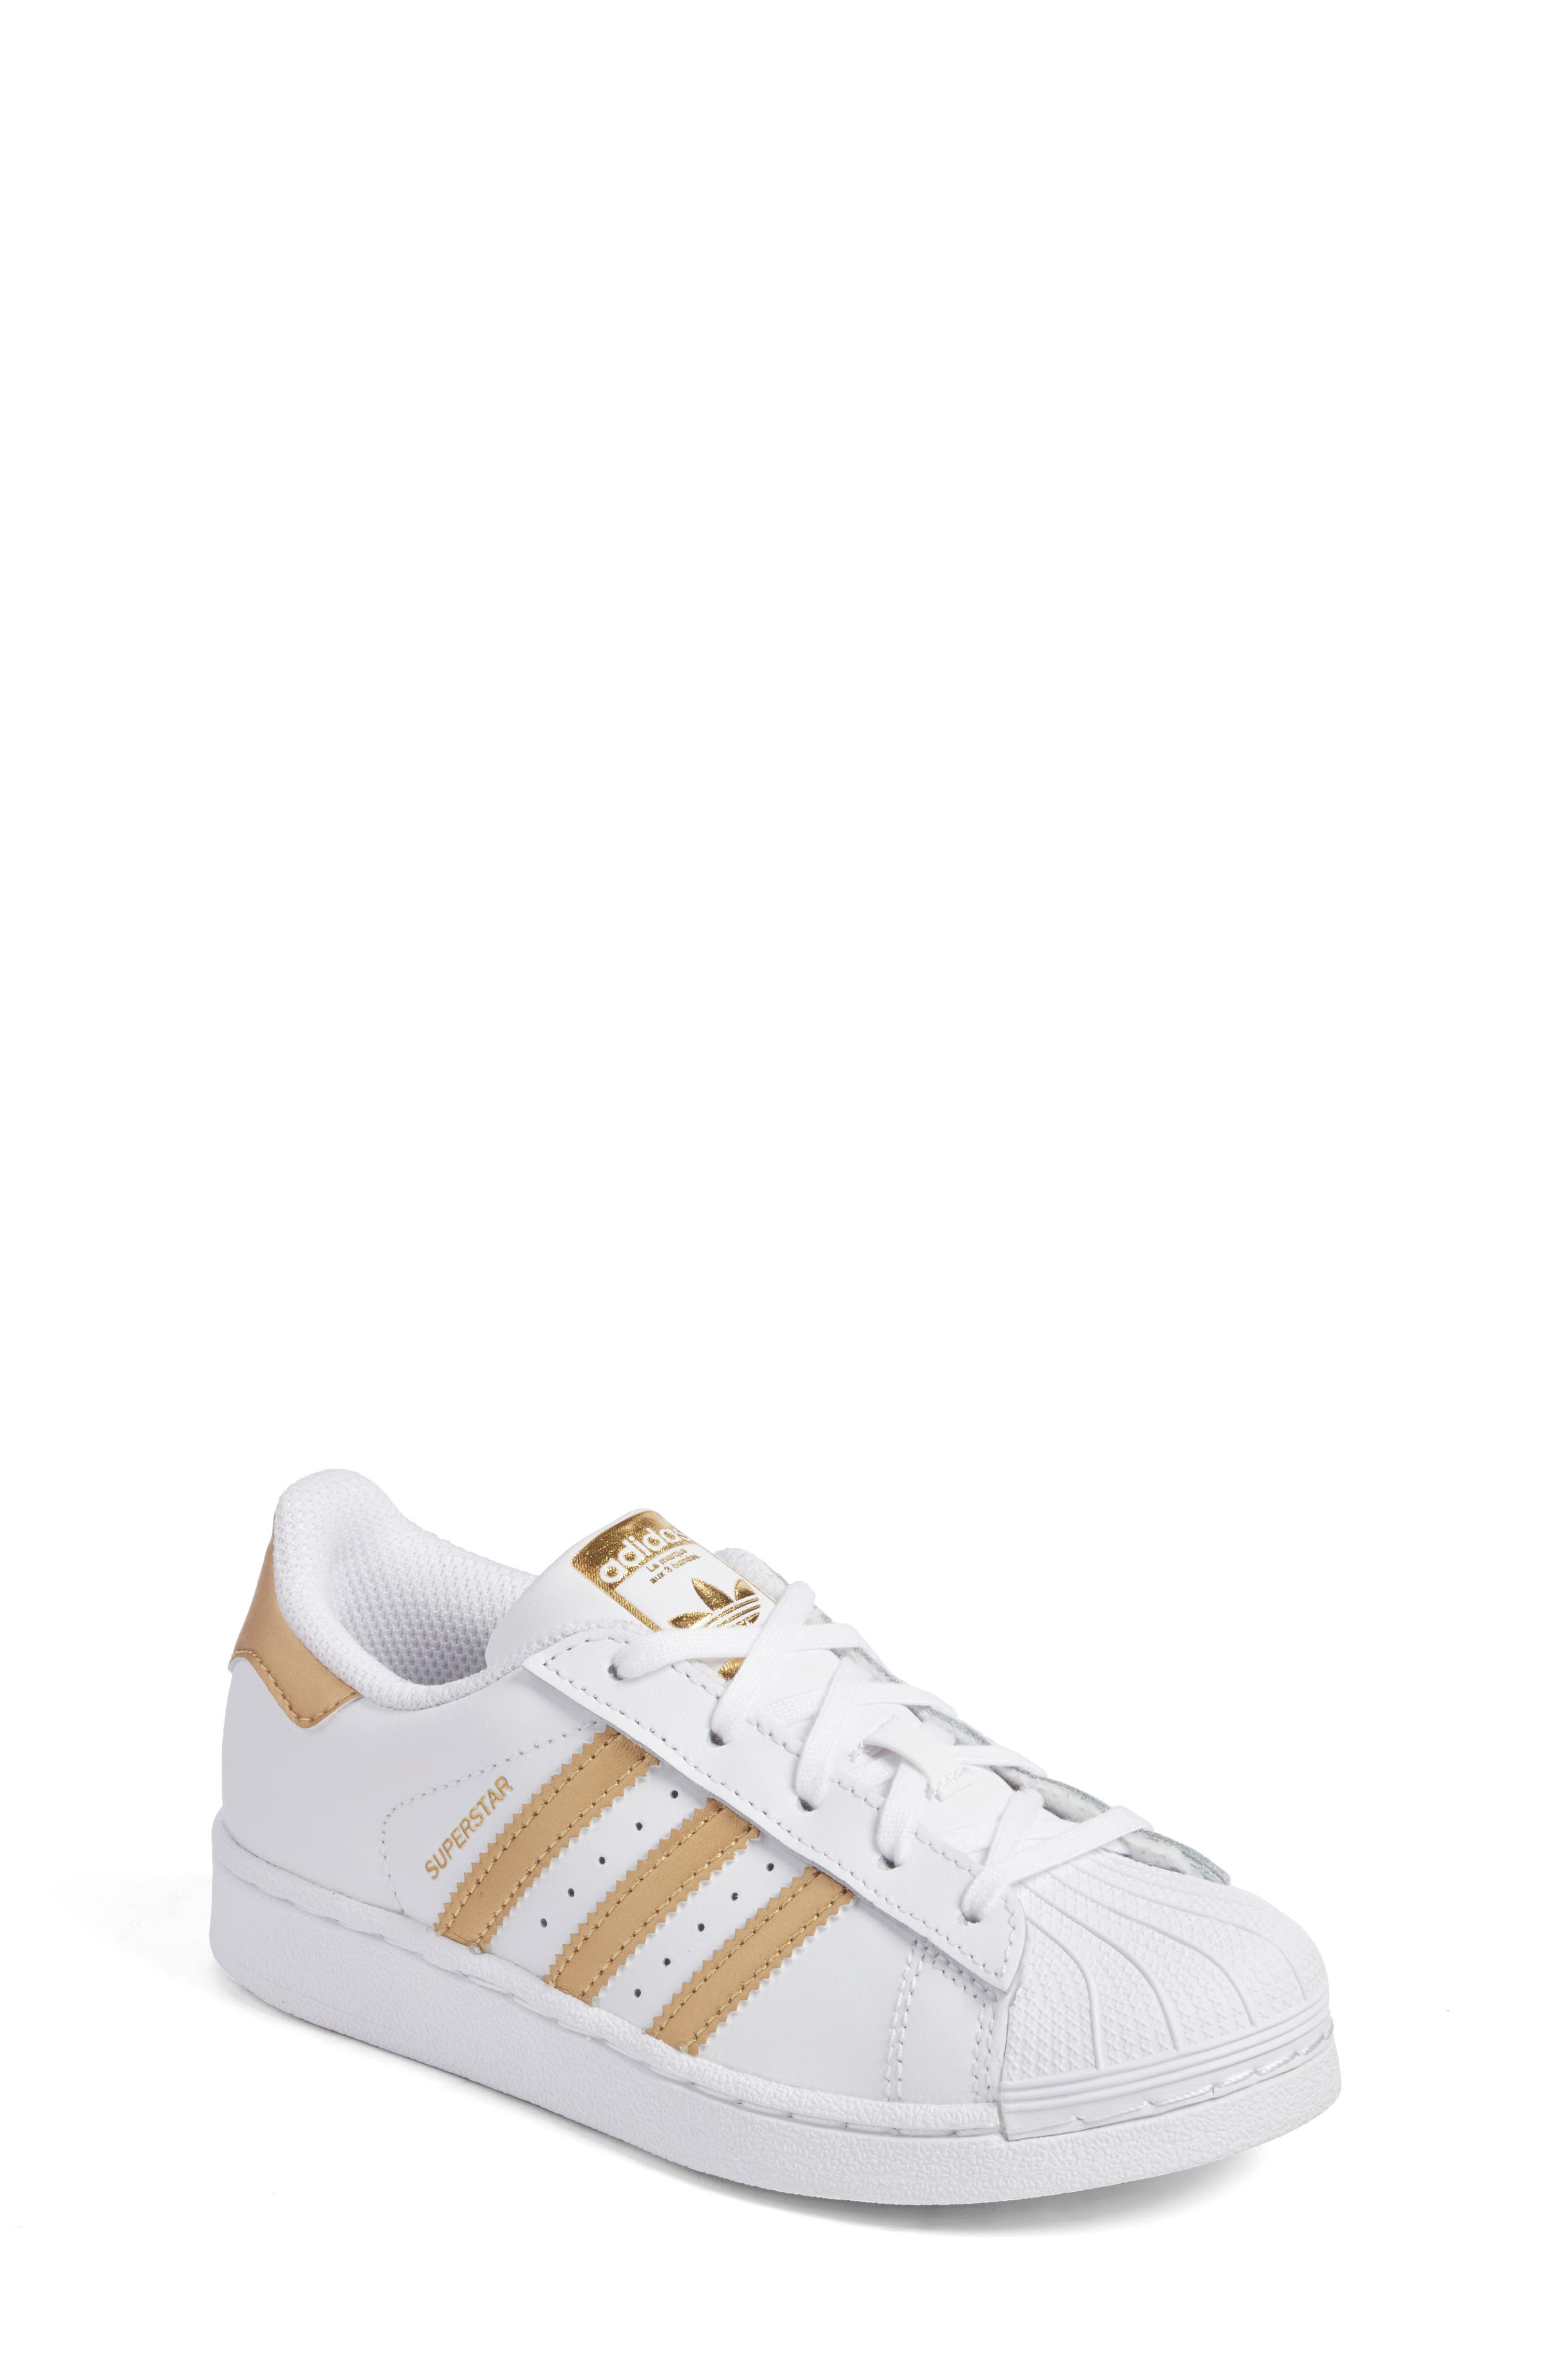 Superstar C Sneaker,                         Main,                         color, 100